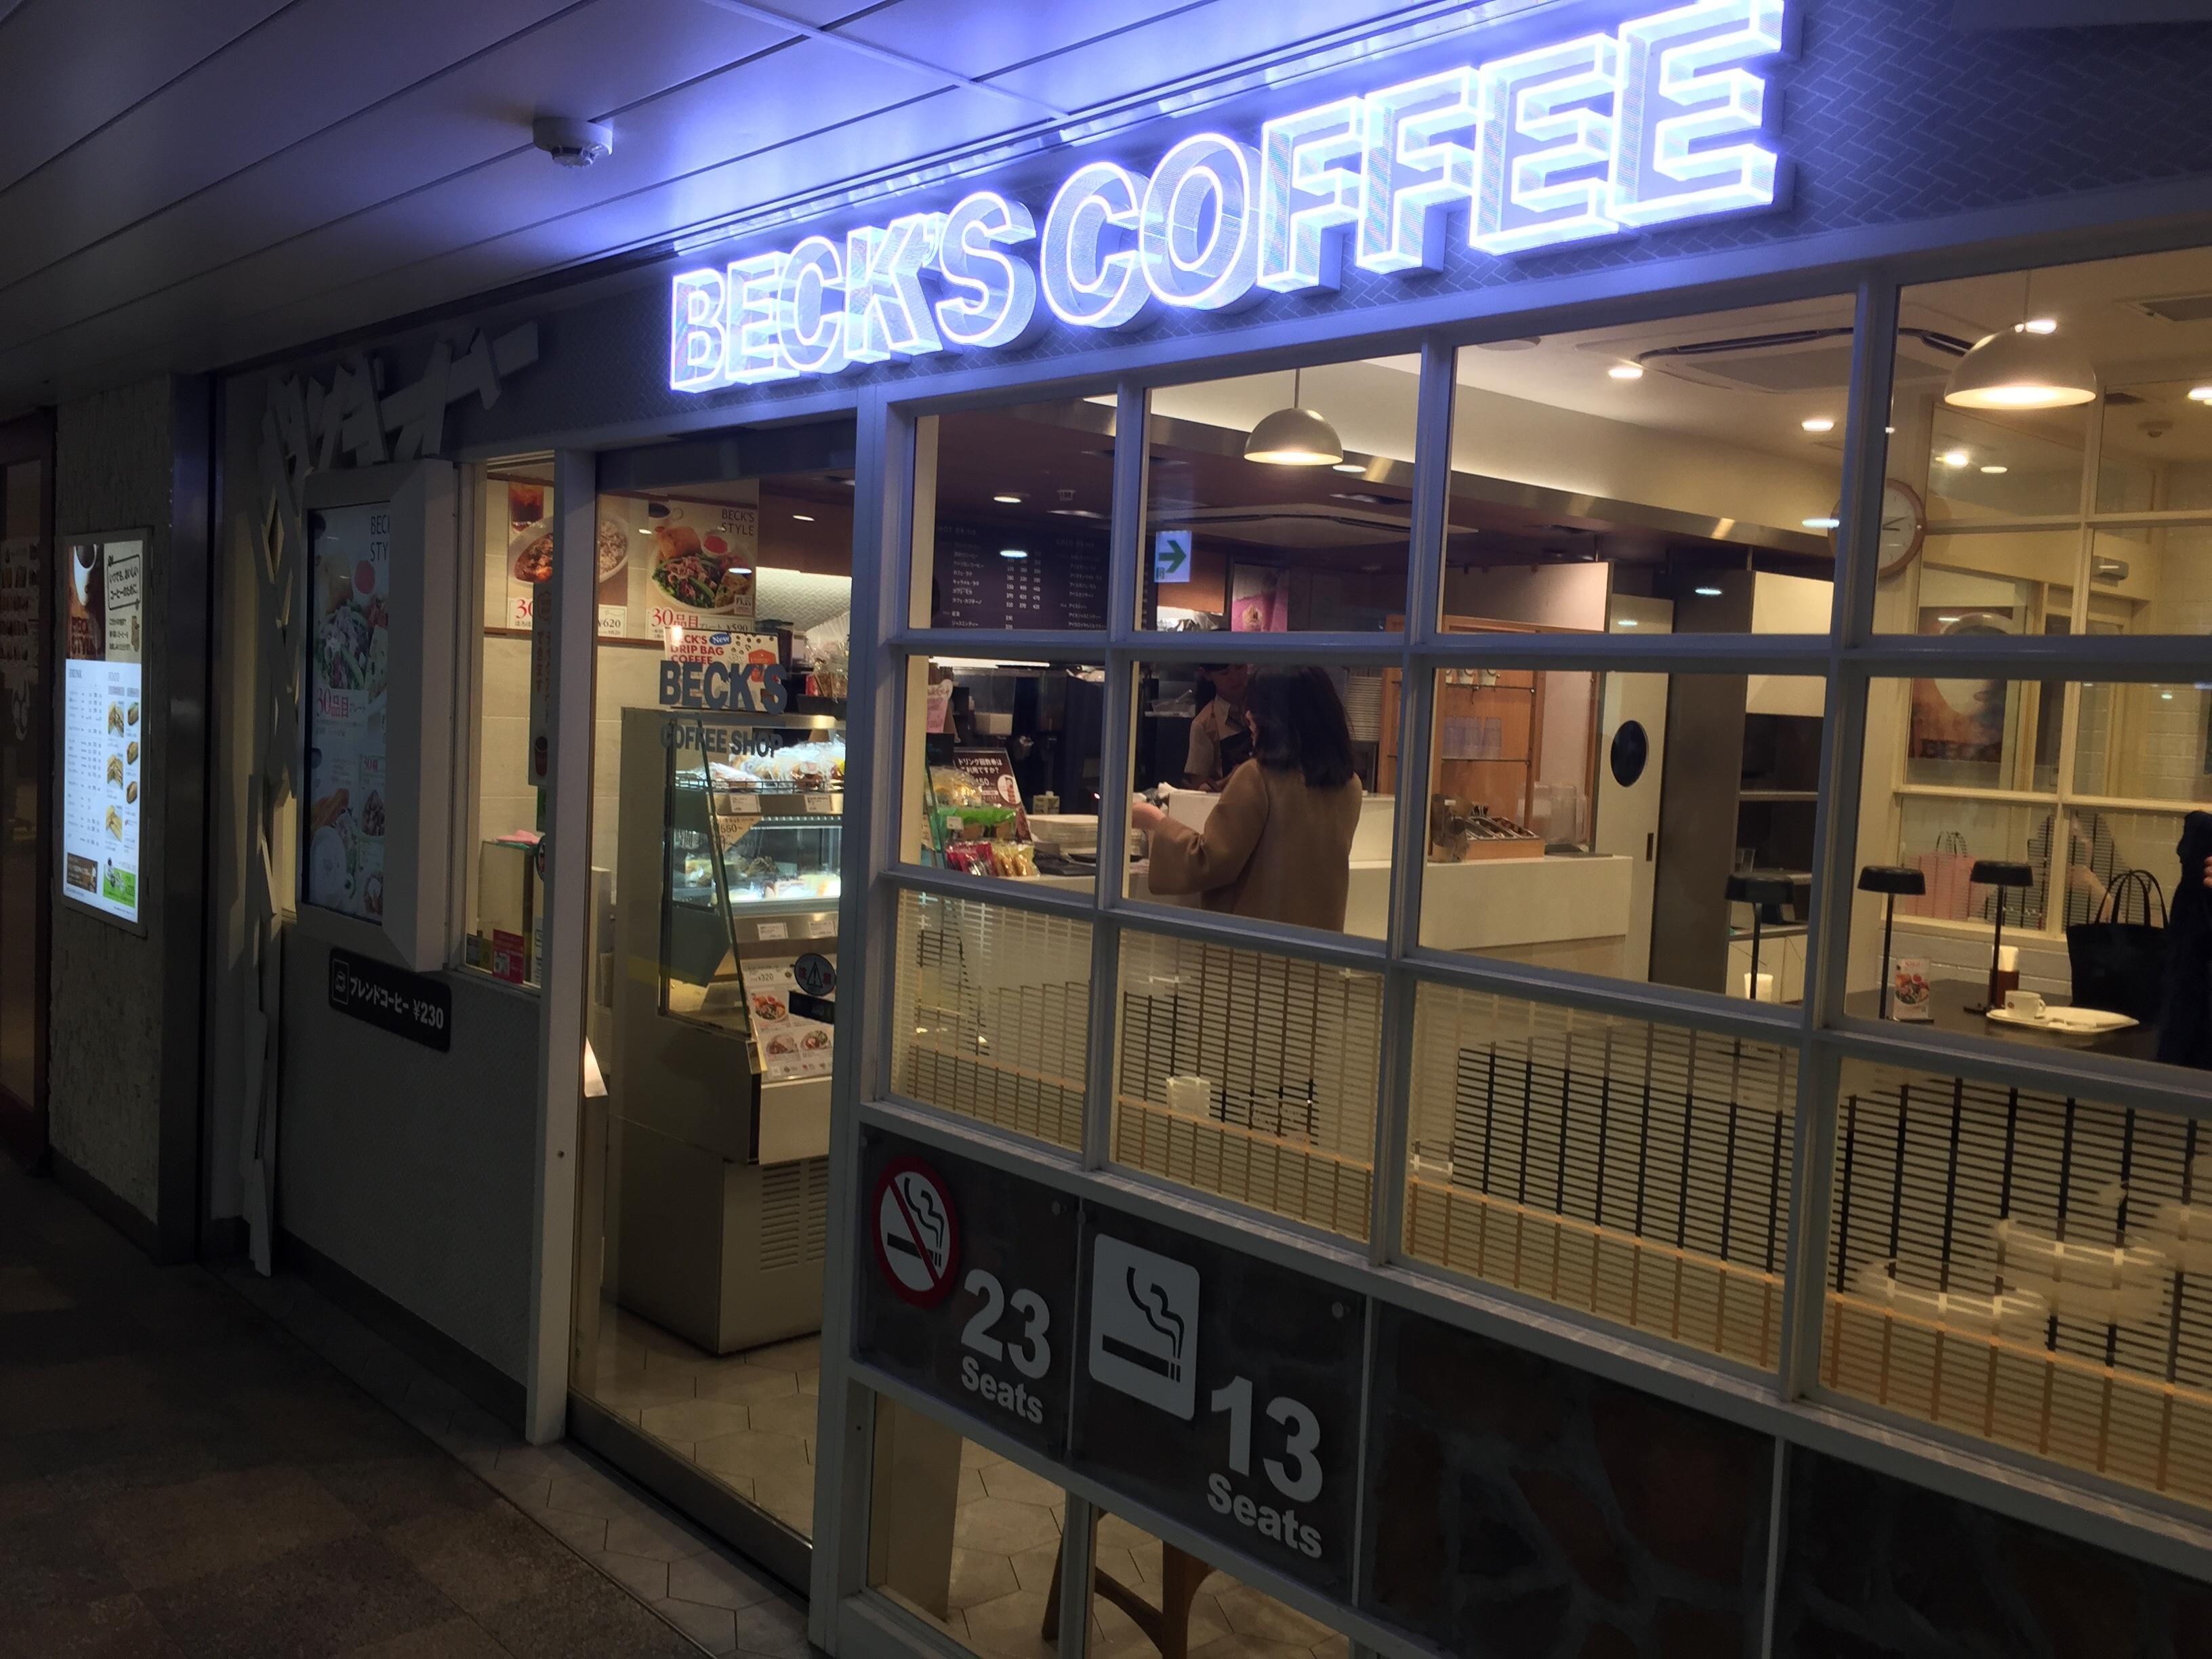 JR船橋駅構内 電源カフェ ベックスコーヒーショップ シャポー船橋店